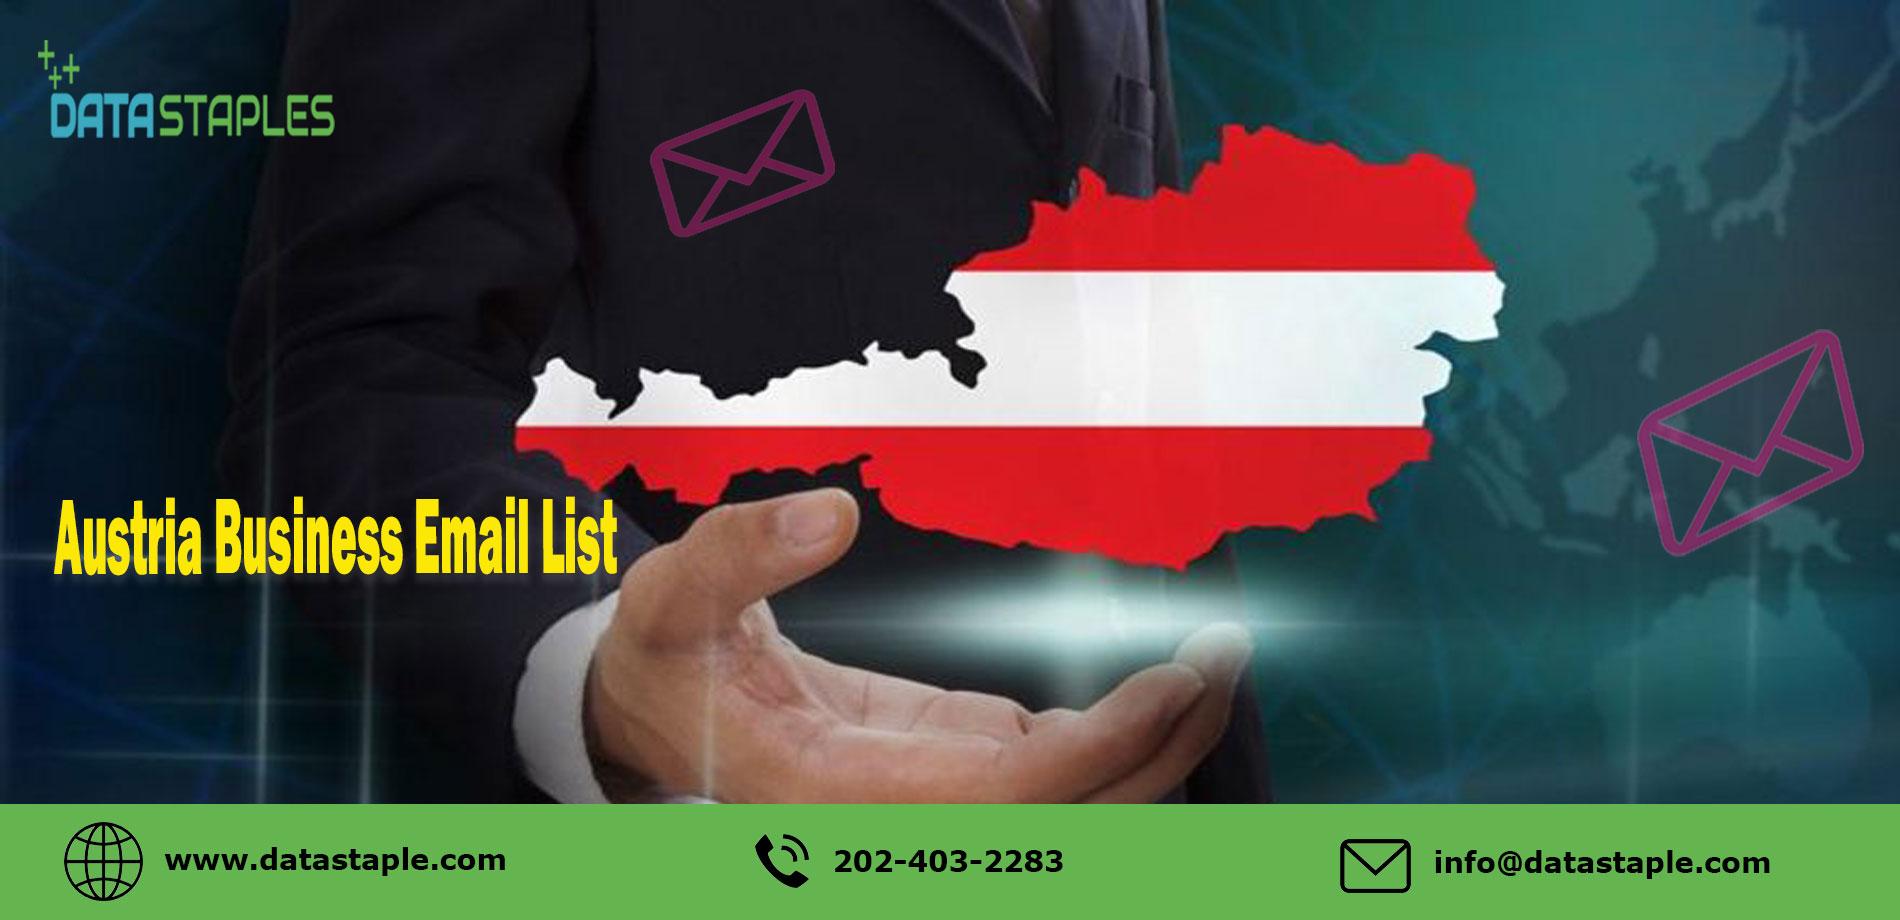 Austria Business Email List   DataStaples